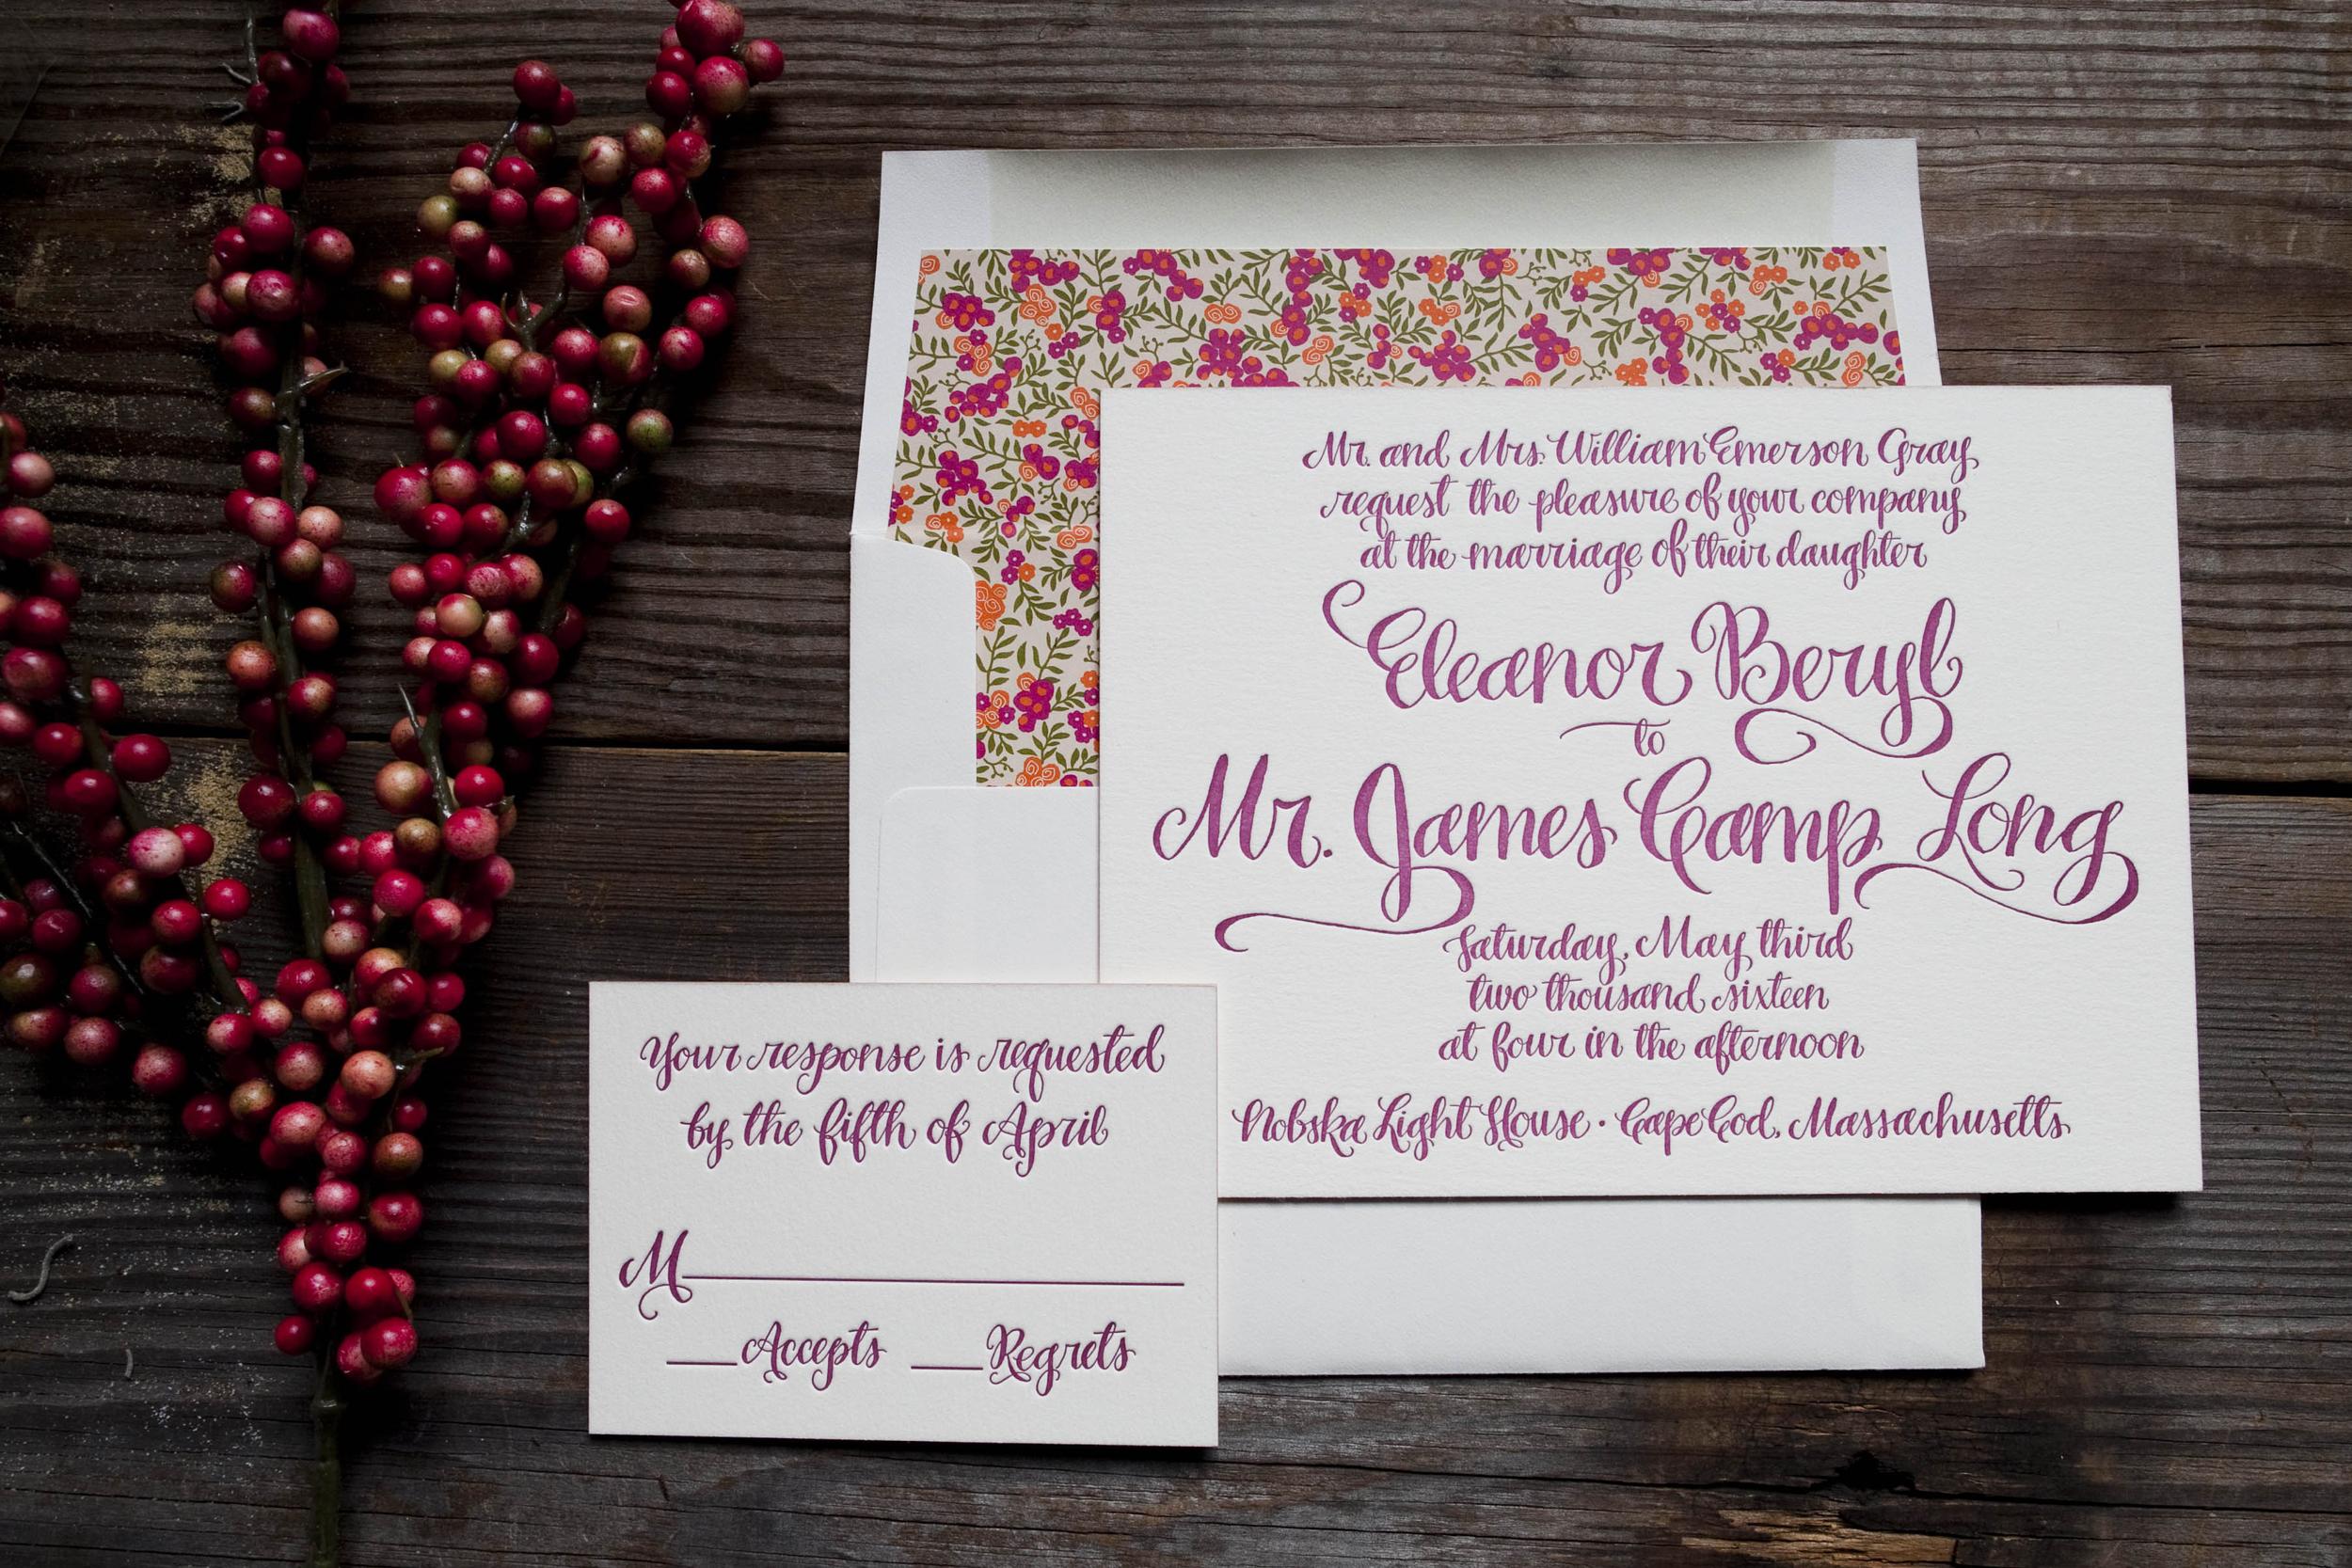 bella wedding invite.jpg